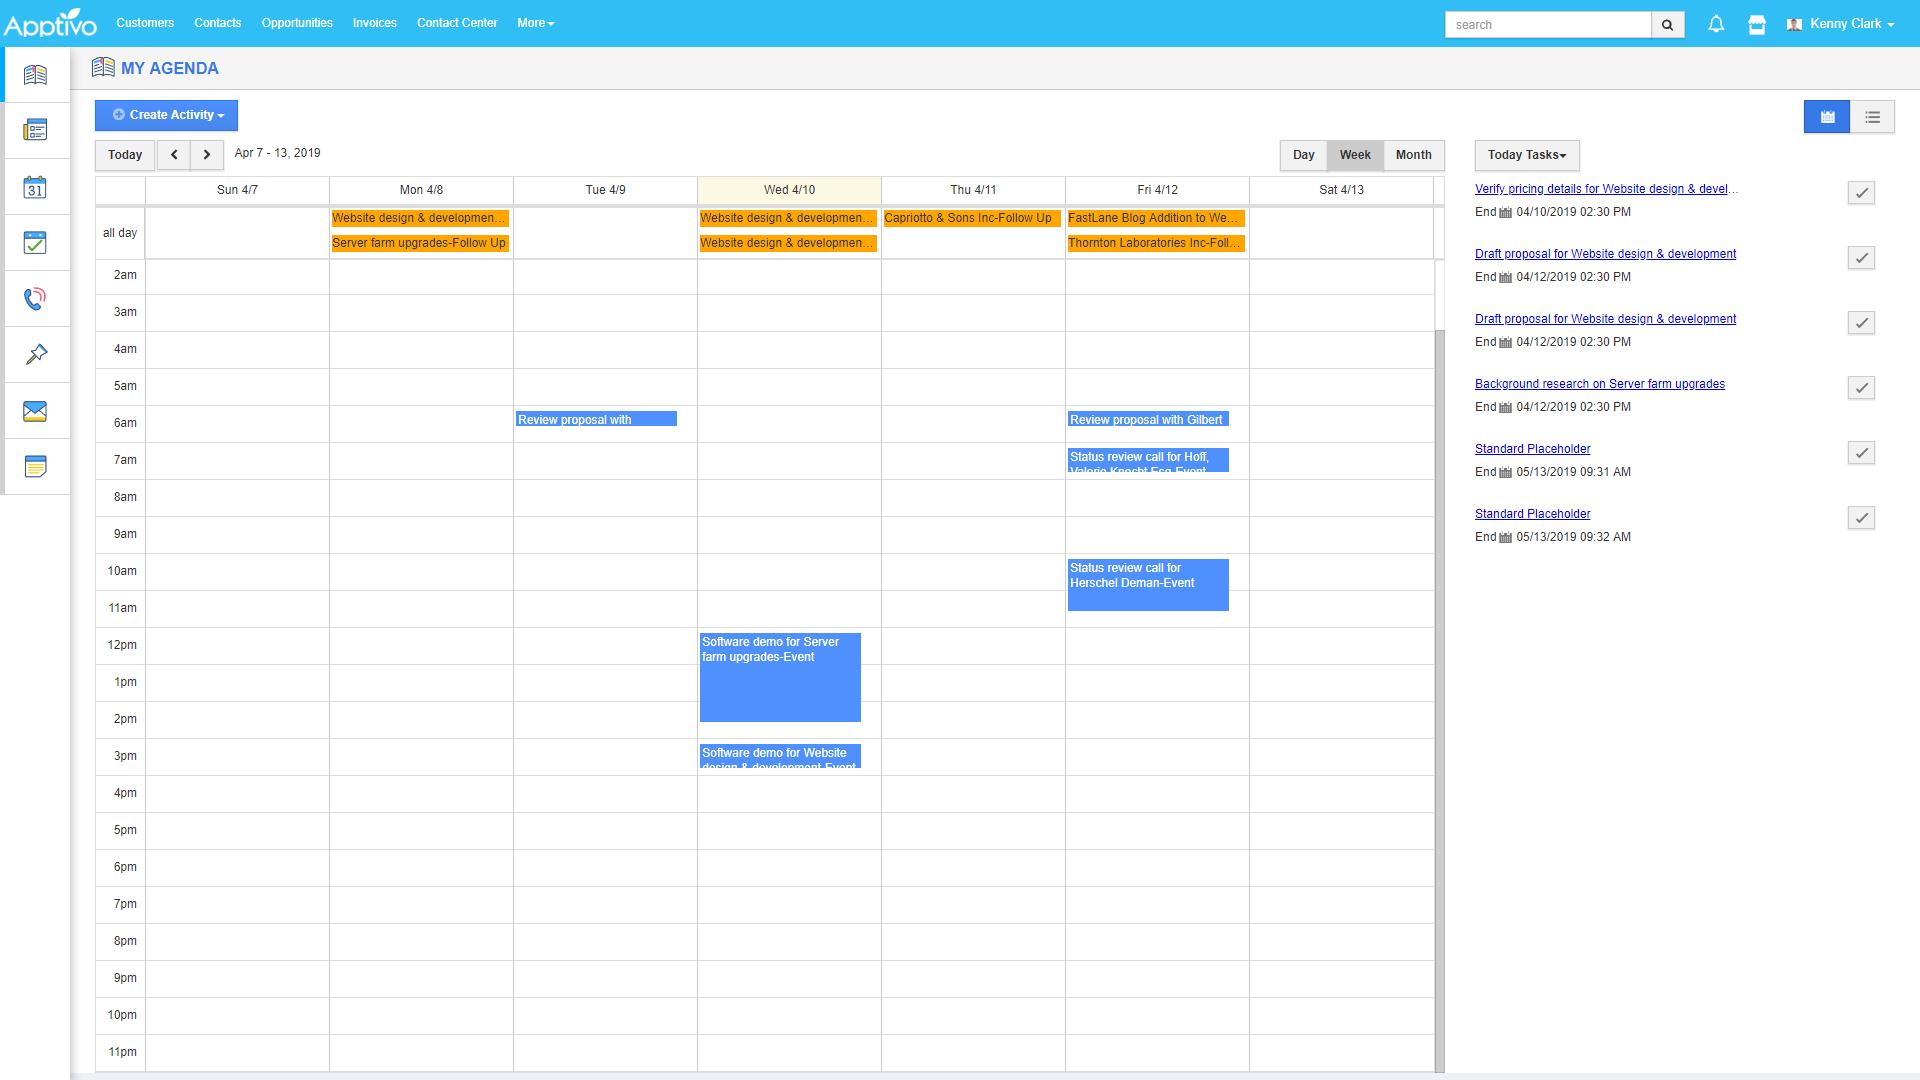 My Agenda Screen